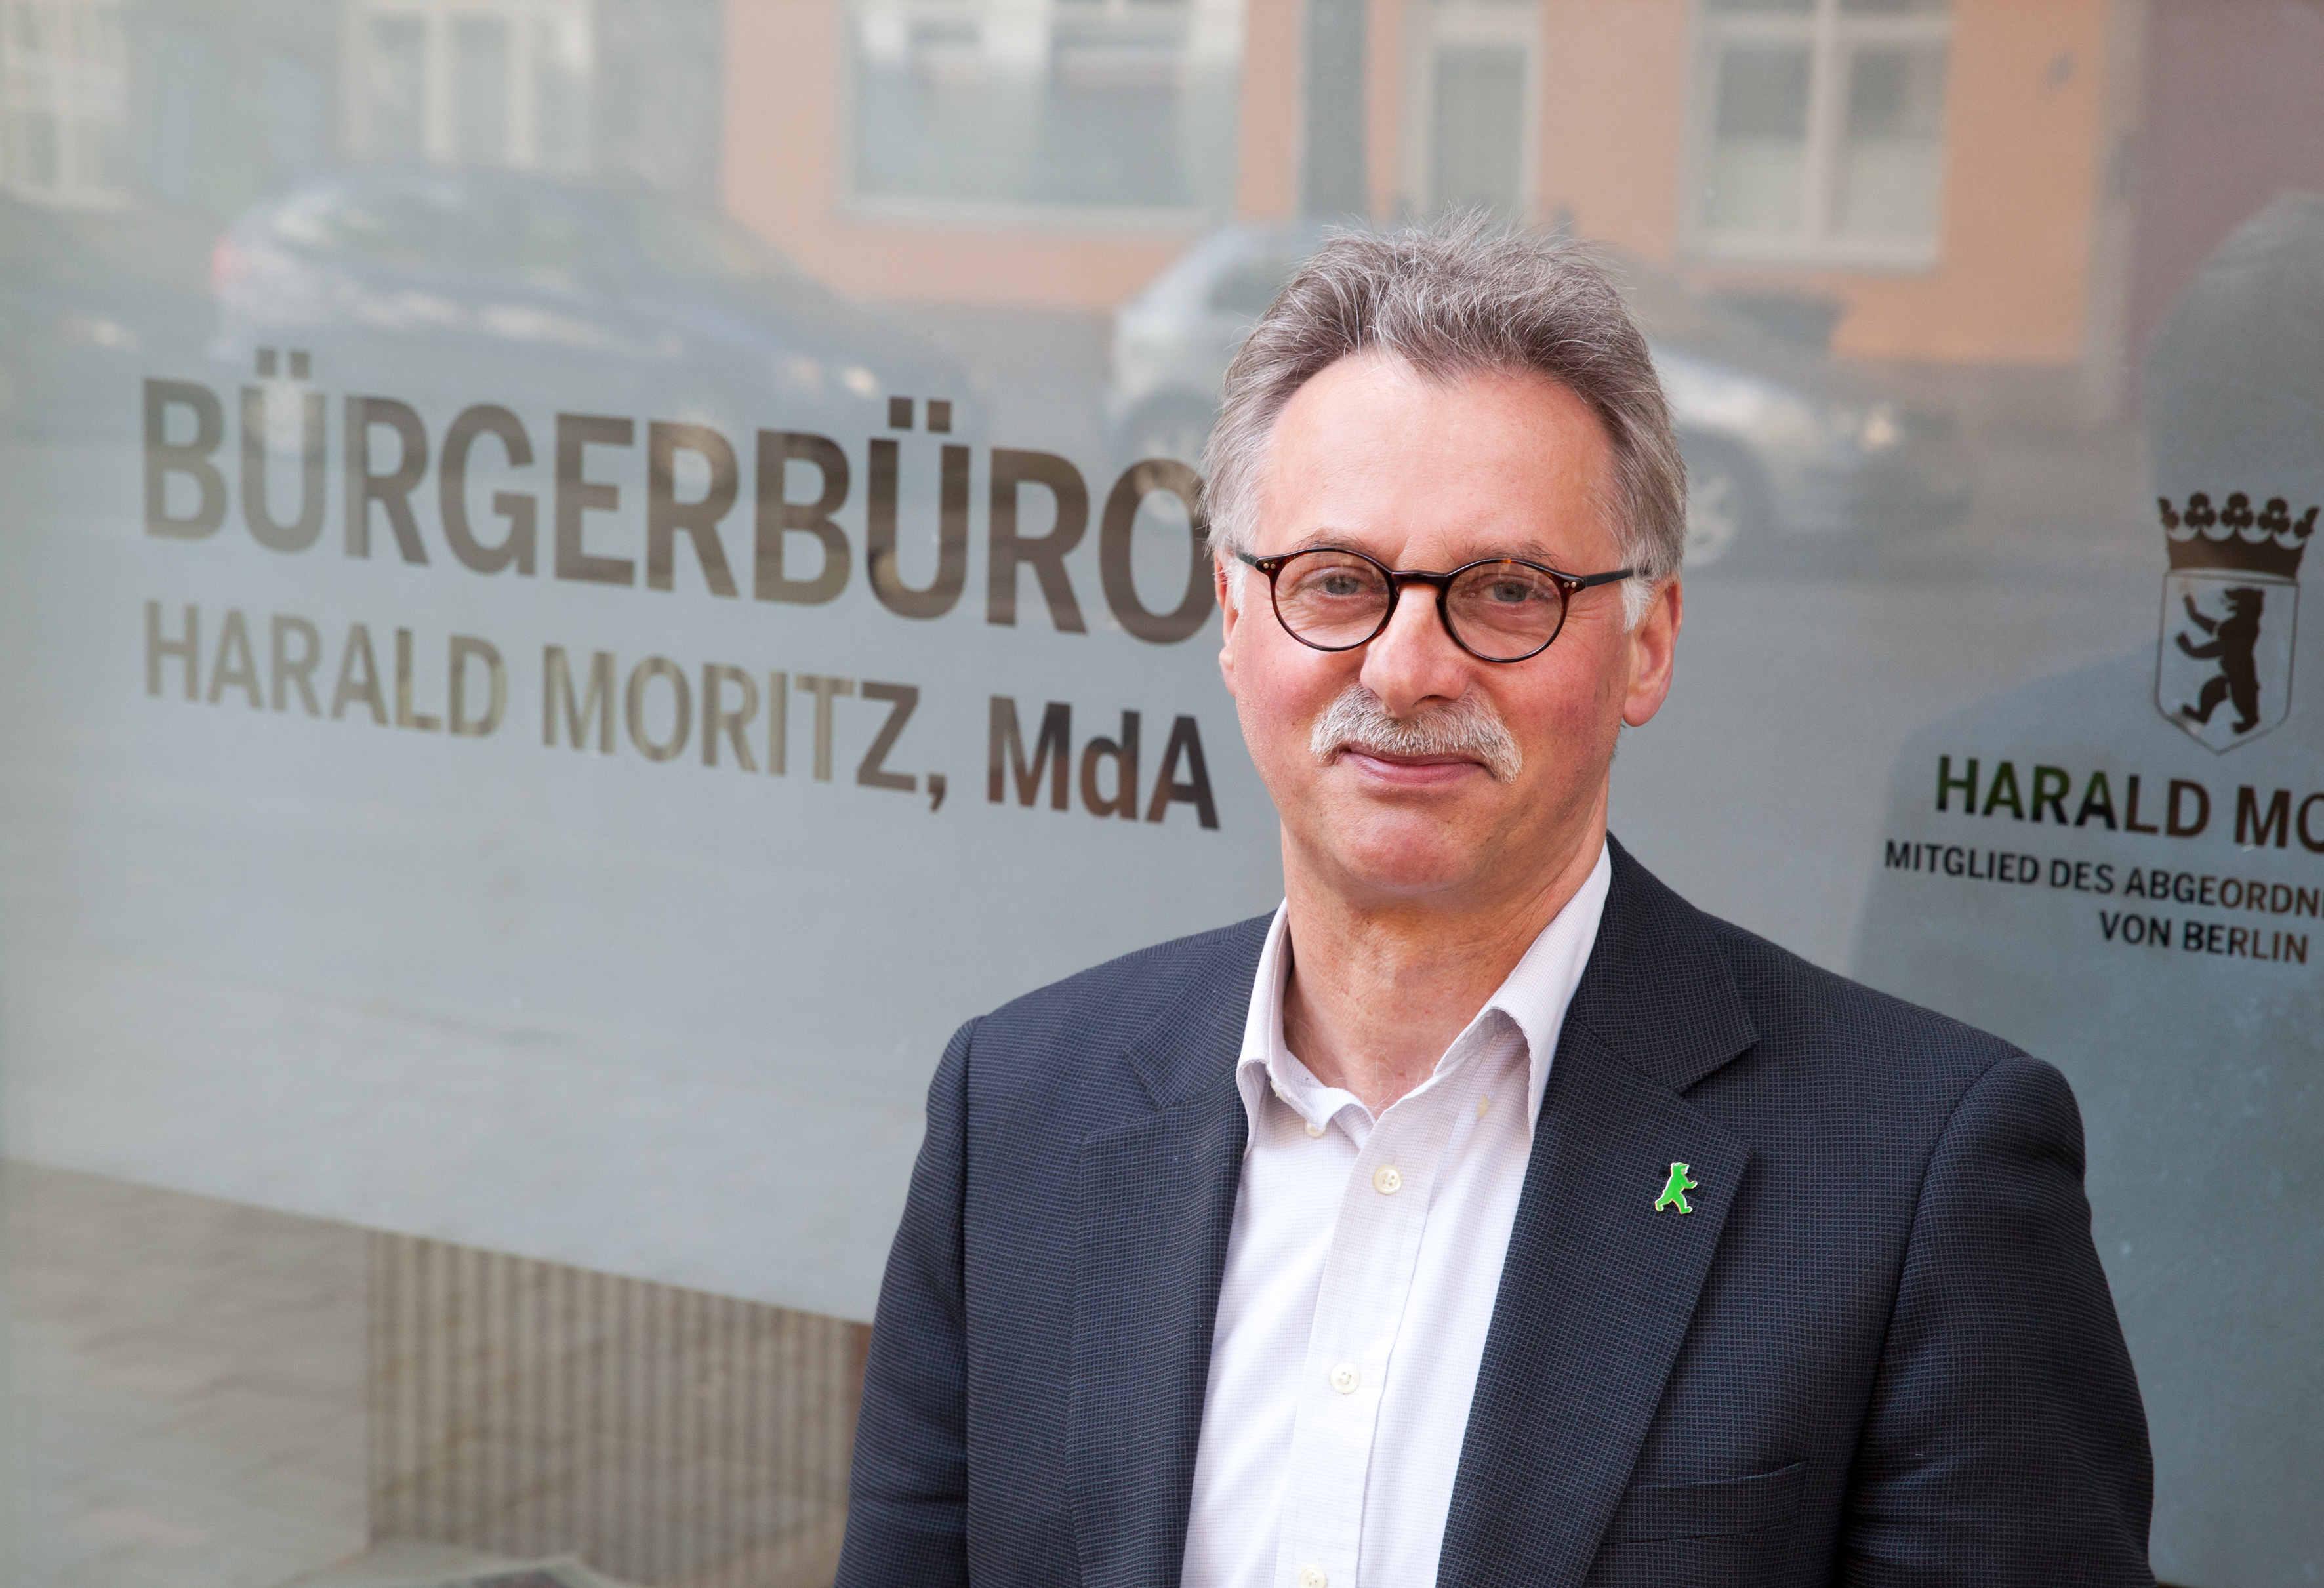 Harald Moritz